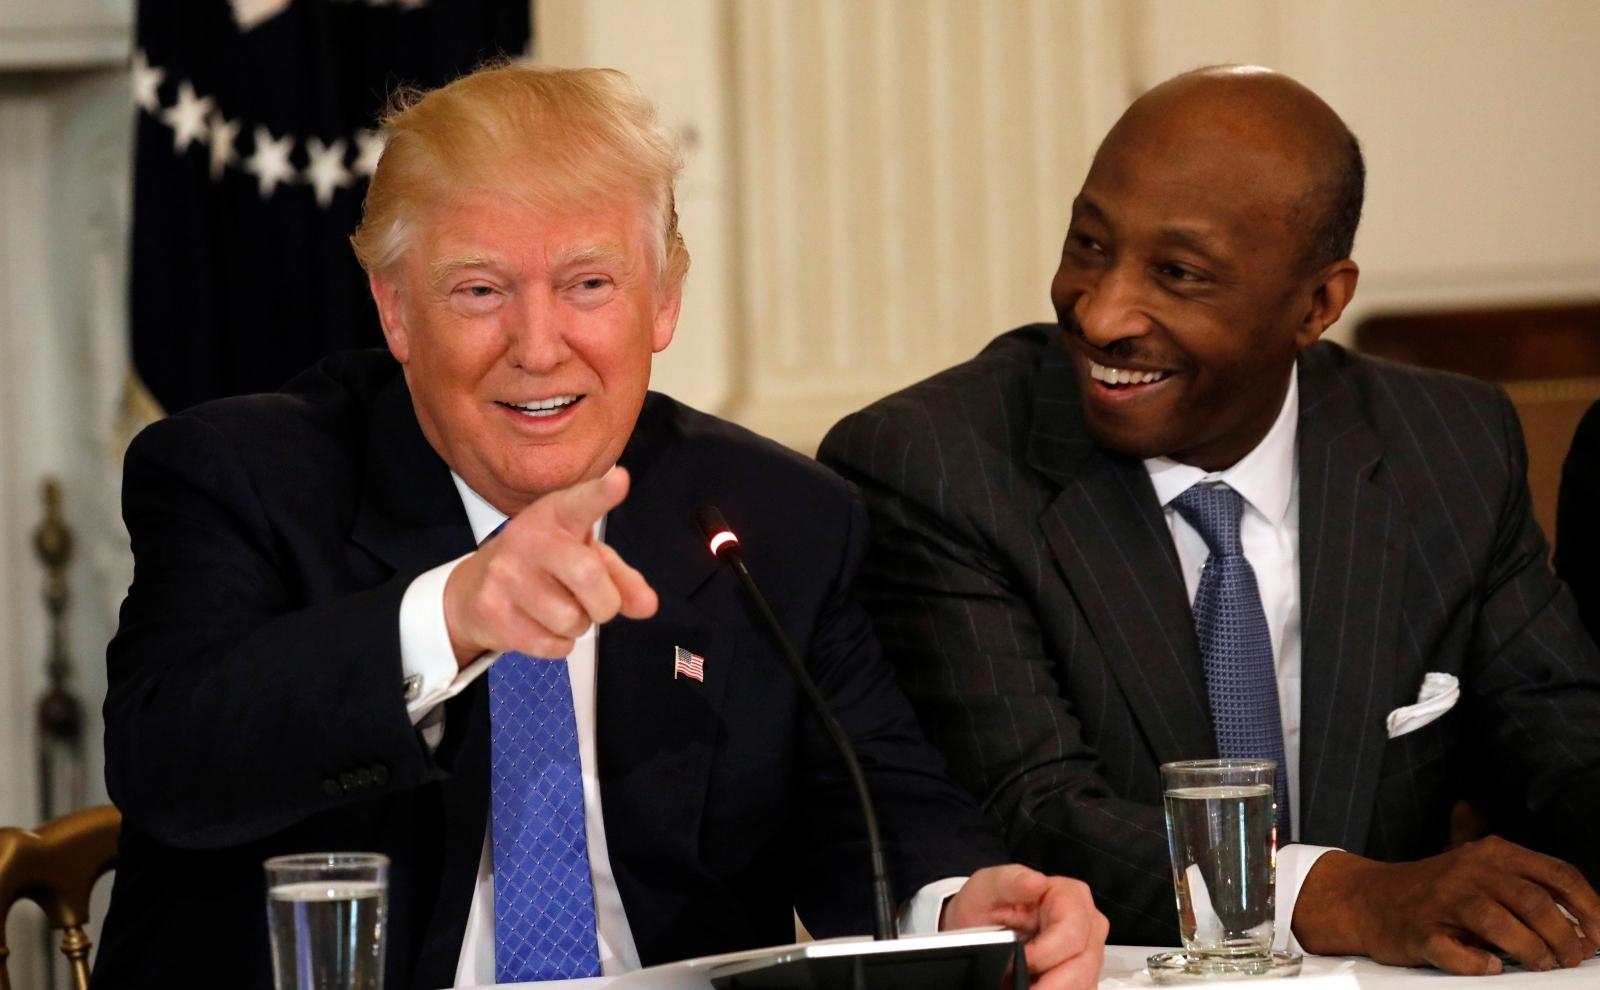 READ: Merck CEO Ken Frazier Quits Manufacturing Council Over Trump Charlottesville Statement